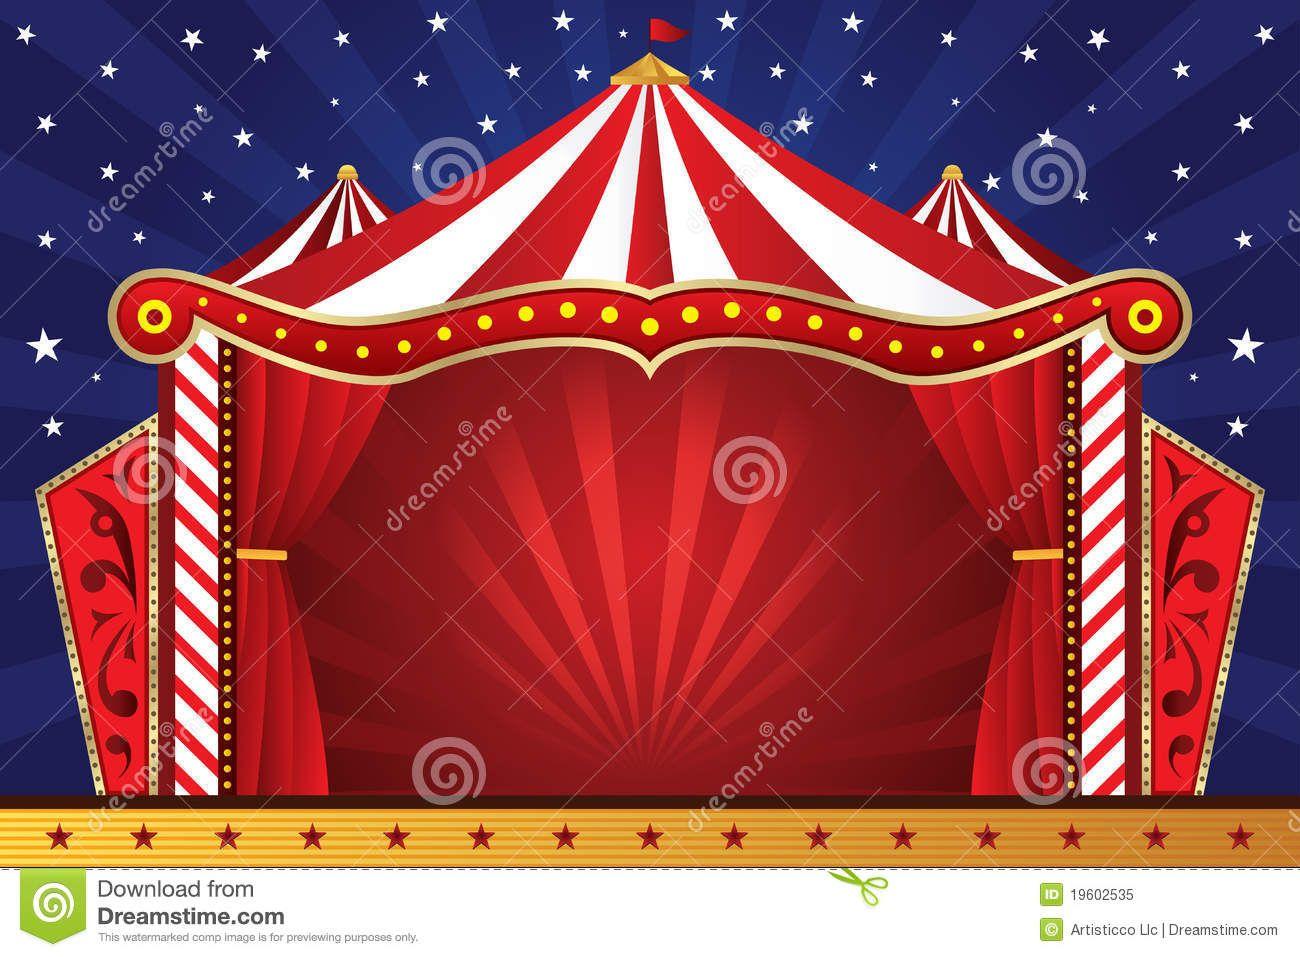 Explore Canvas Tent Striped Table and more! & fondo-del-circo-19602535.jpg (1300×957) | fondos | Pinterest